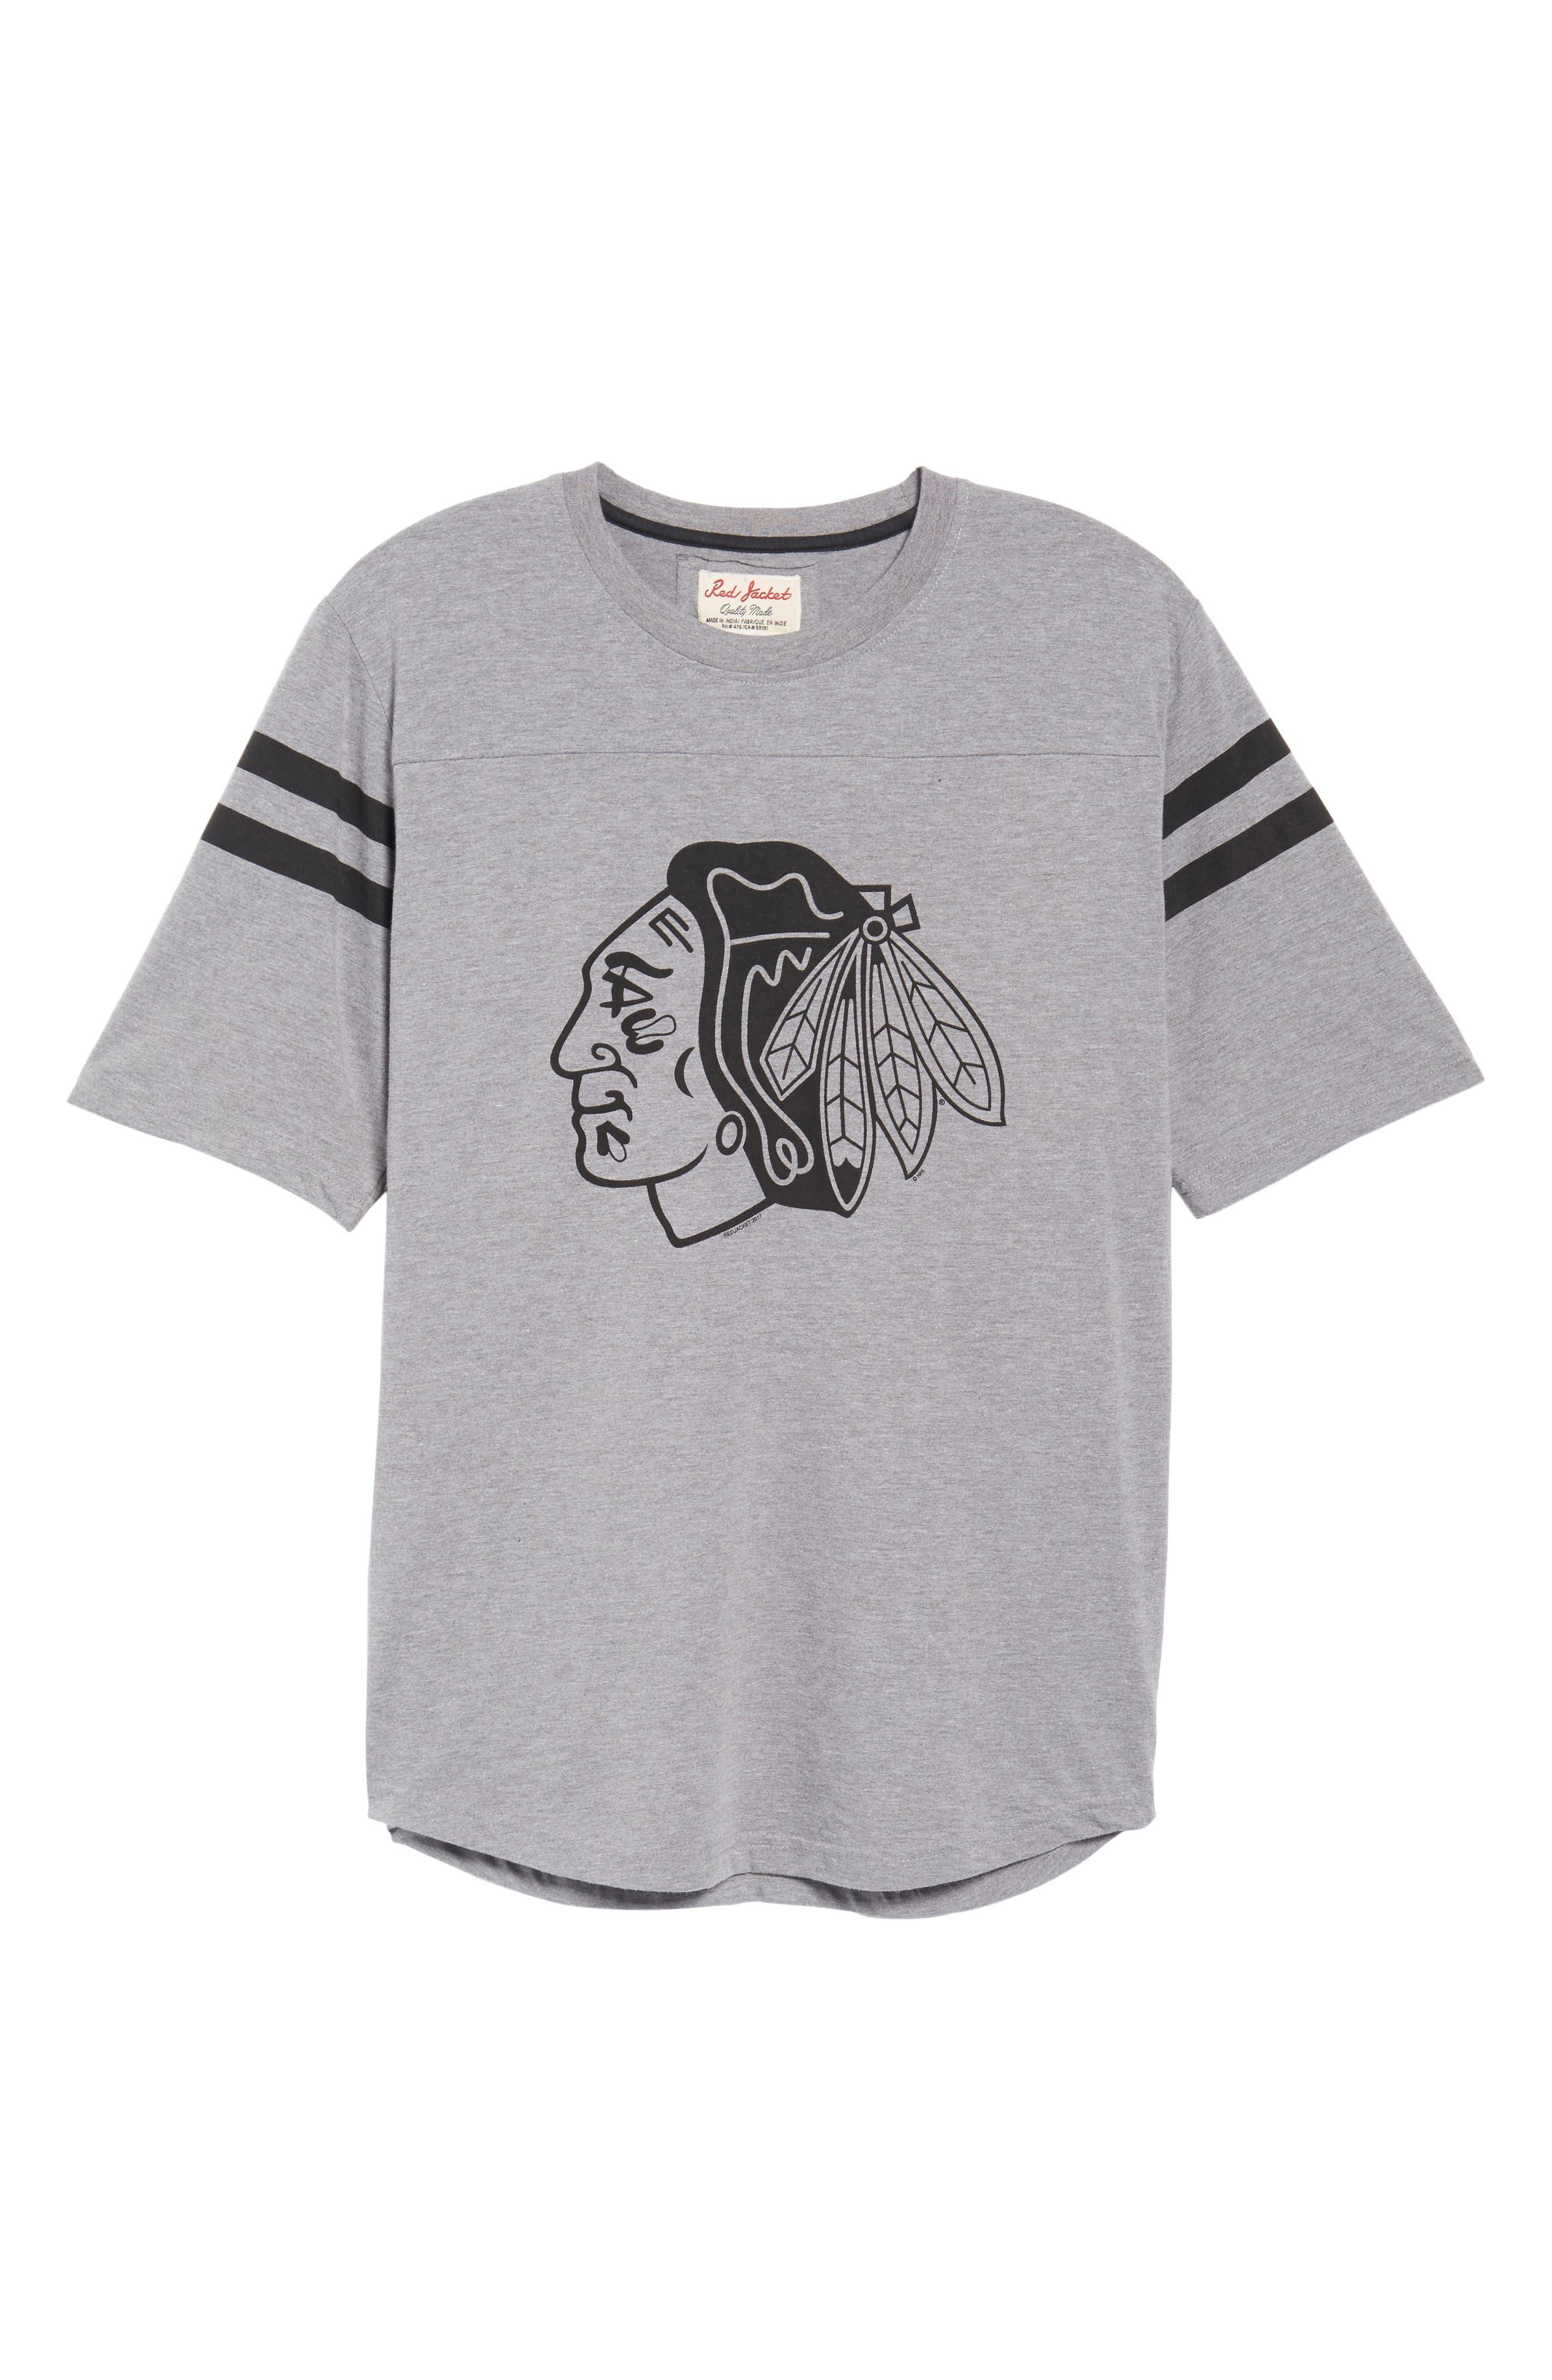 Crosby Chicago Blackhawks T-Shirt,                             Alternate thumbnail 6, color,                             Heather Grey